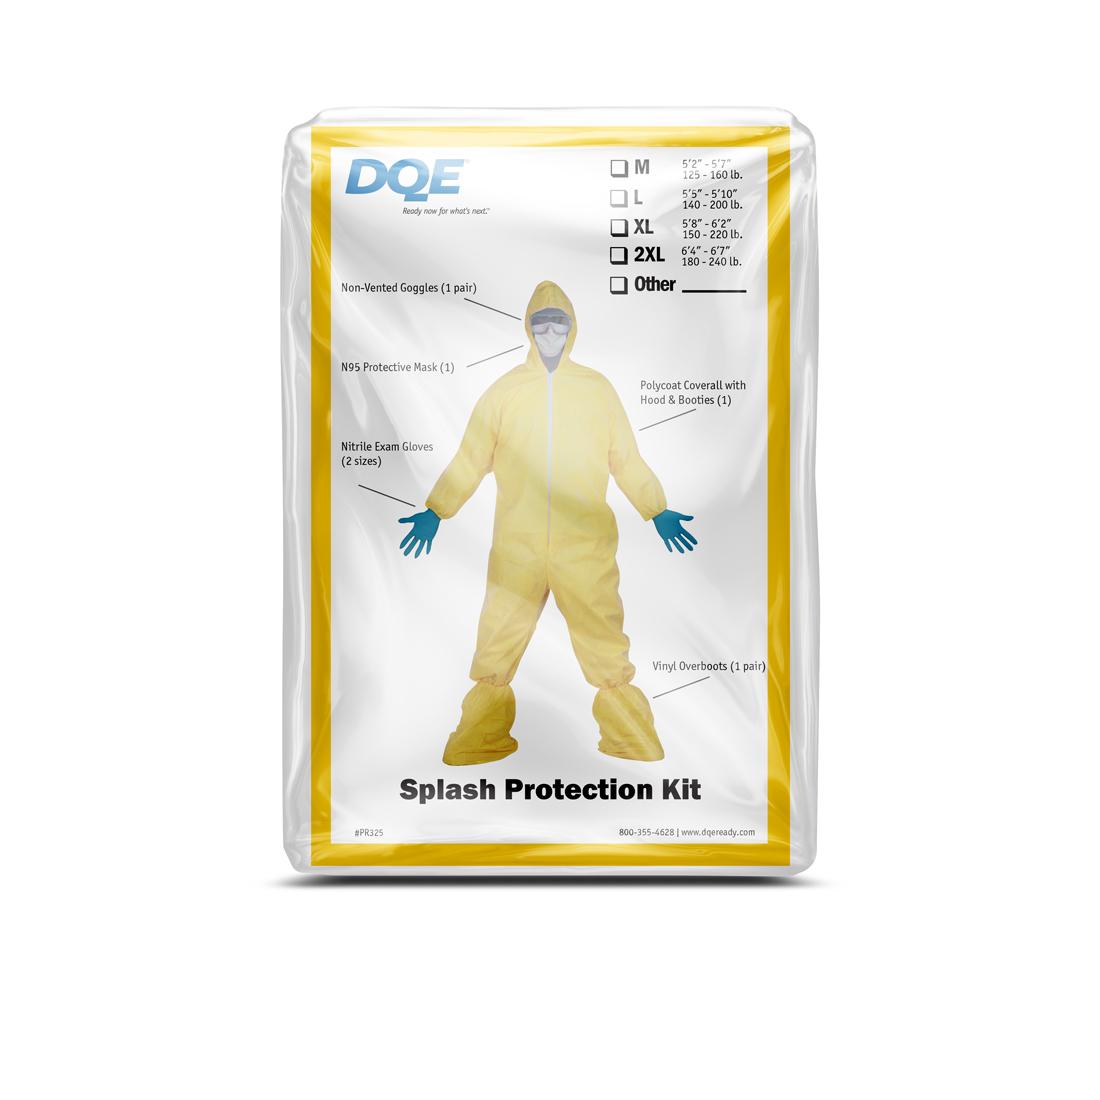 Splash Protection Kit Pack image